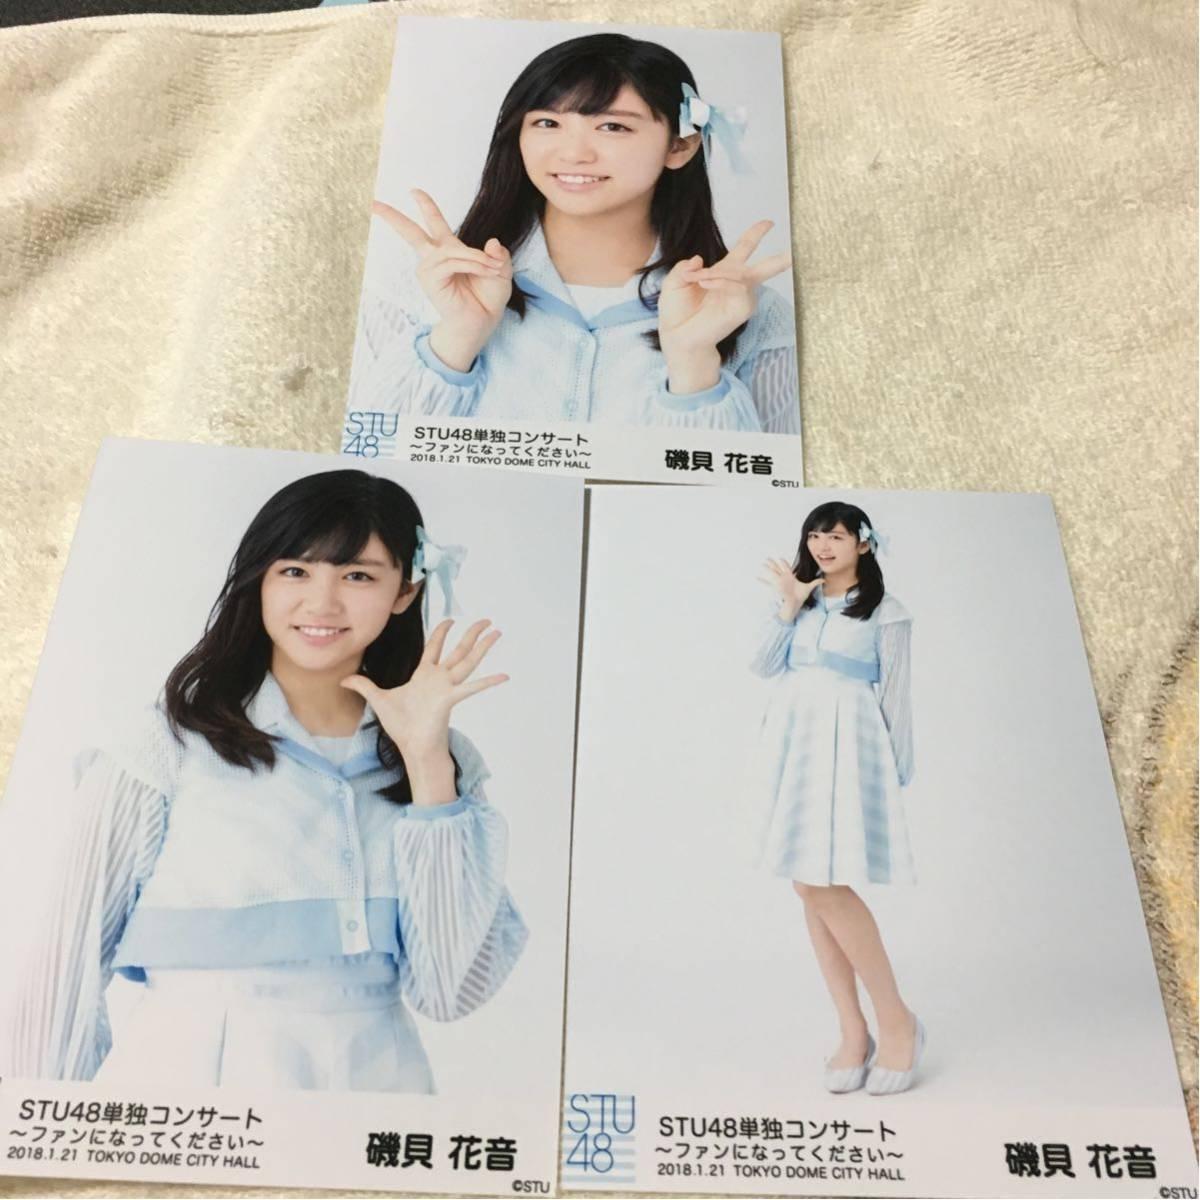 STU48 単独コンサート 1/21 TDC 生写真 3種コンプ 磯貝花音